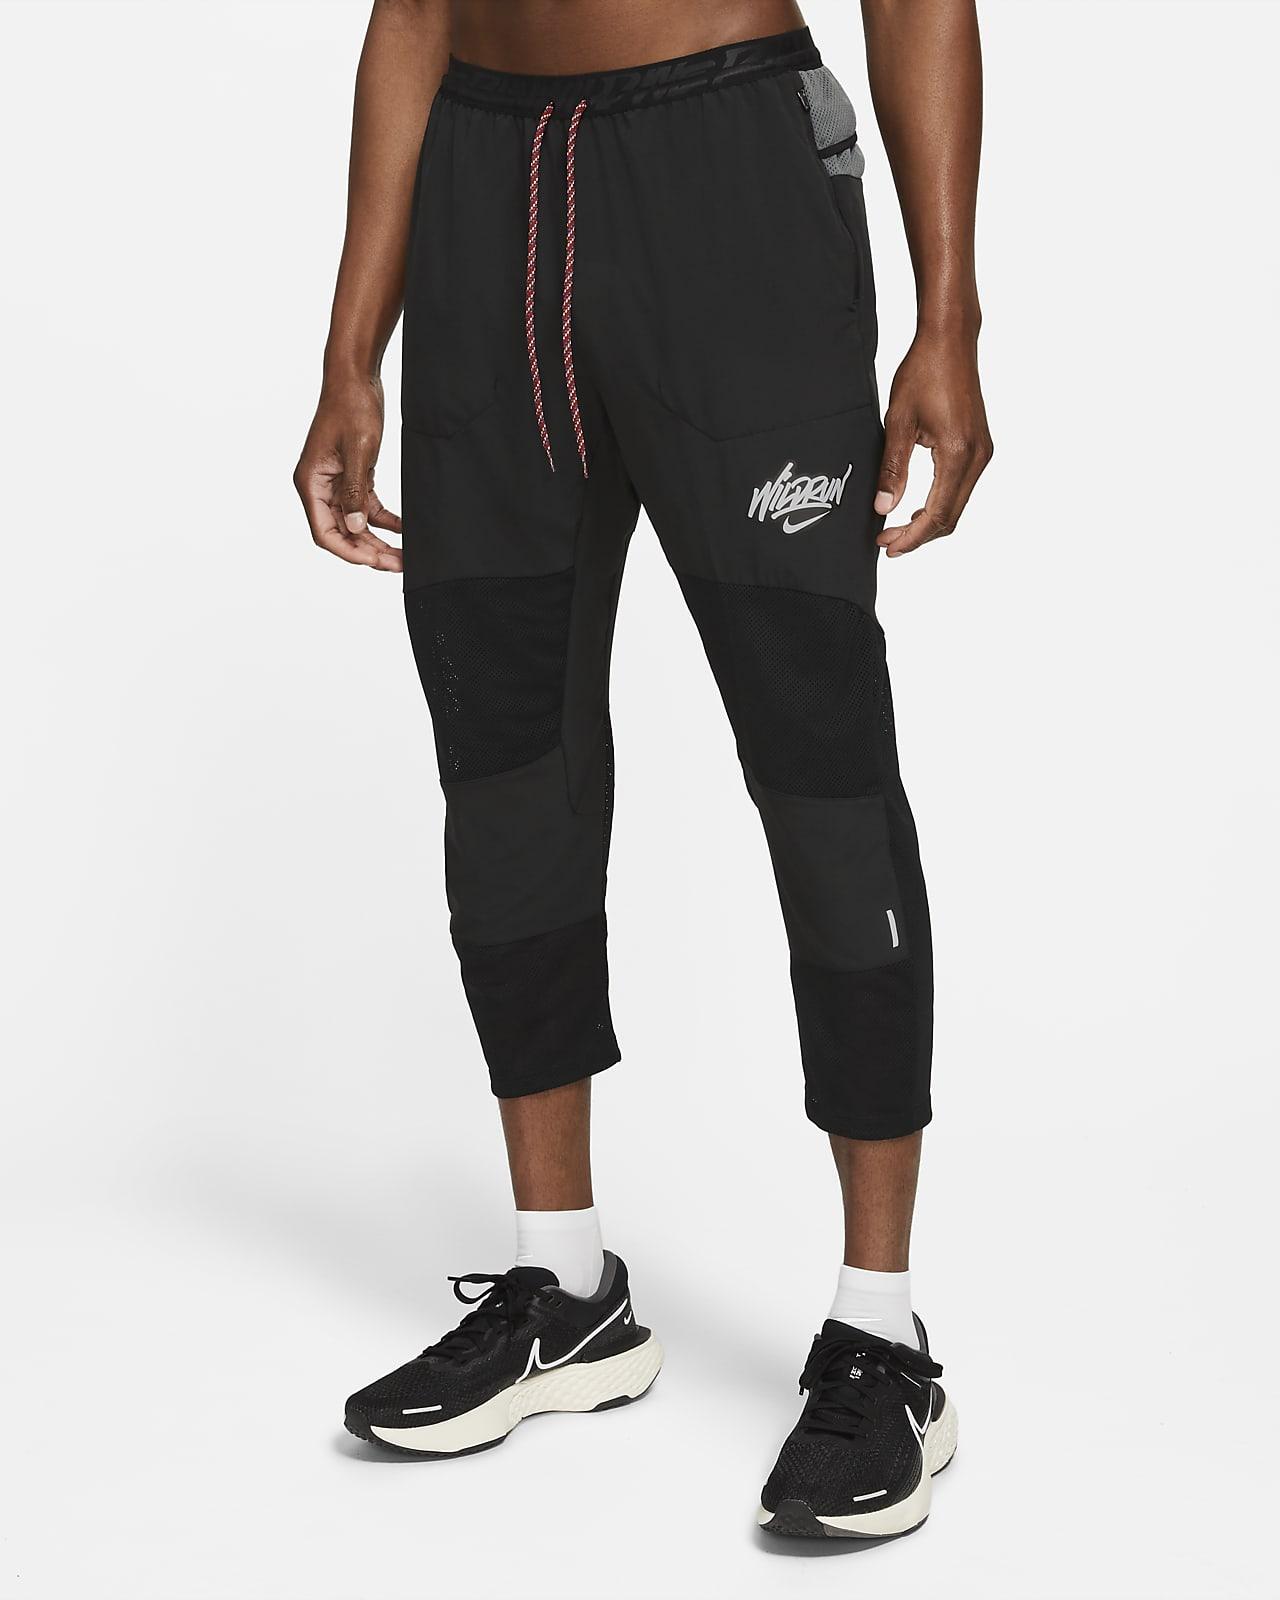 Nike Phenom Elite Wild Run Men's 7/8 Woven Running Pants